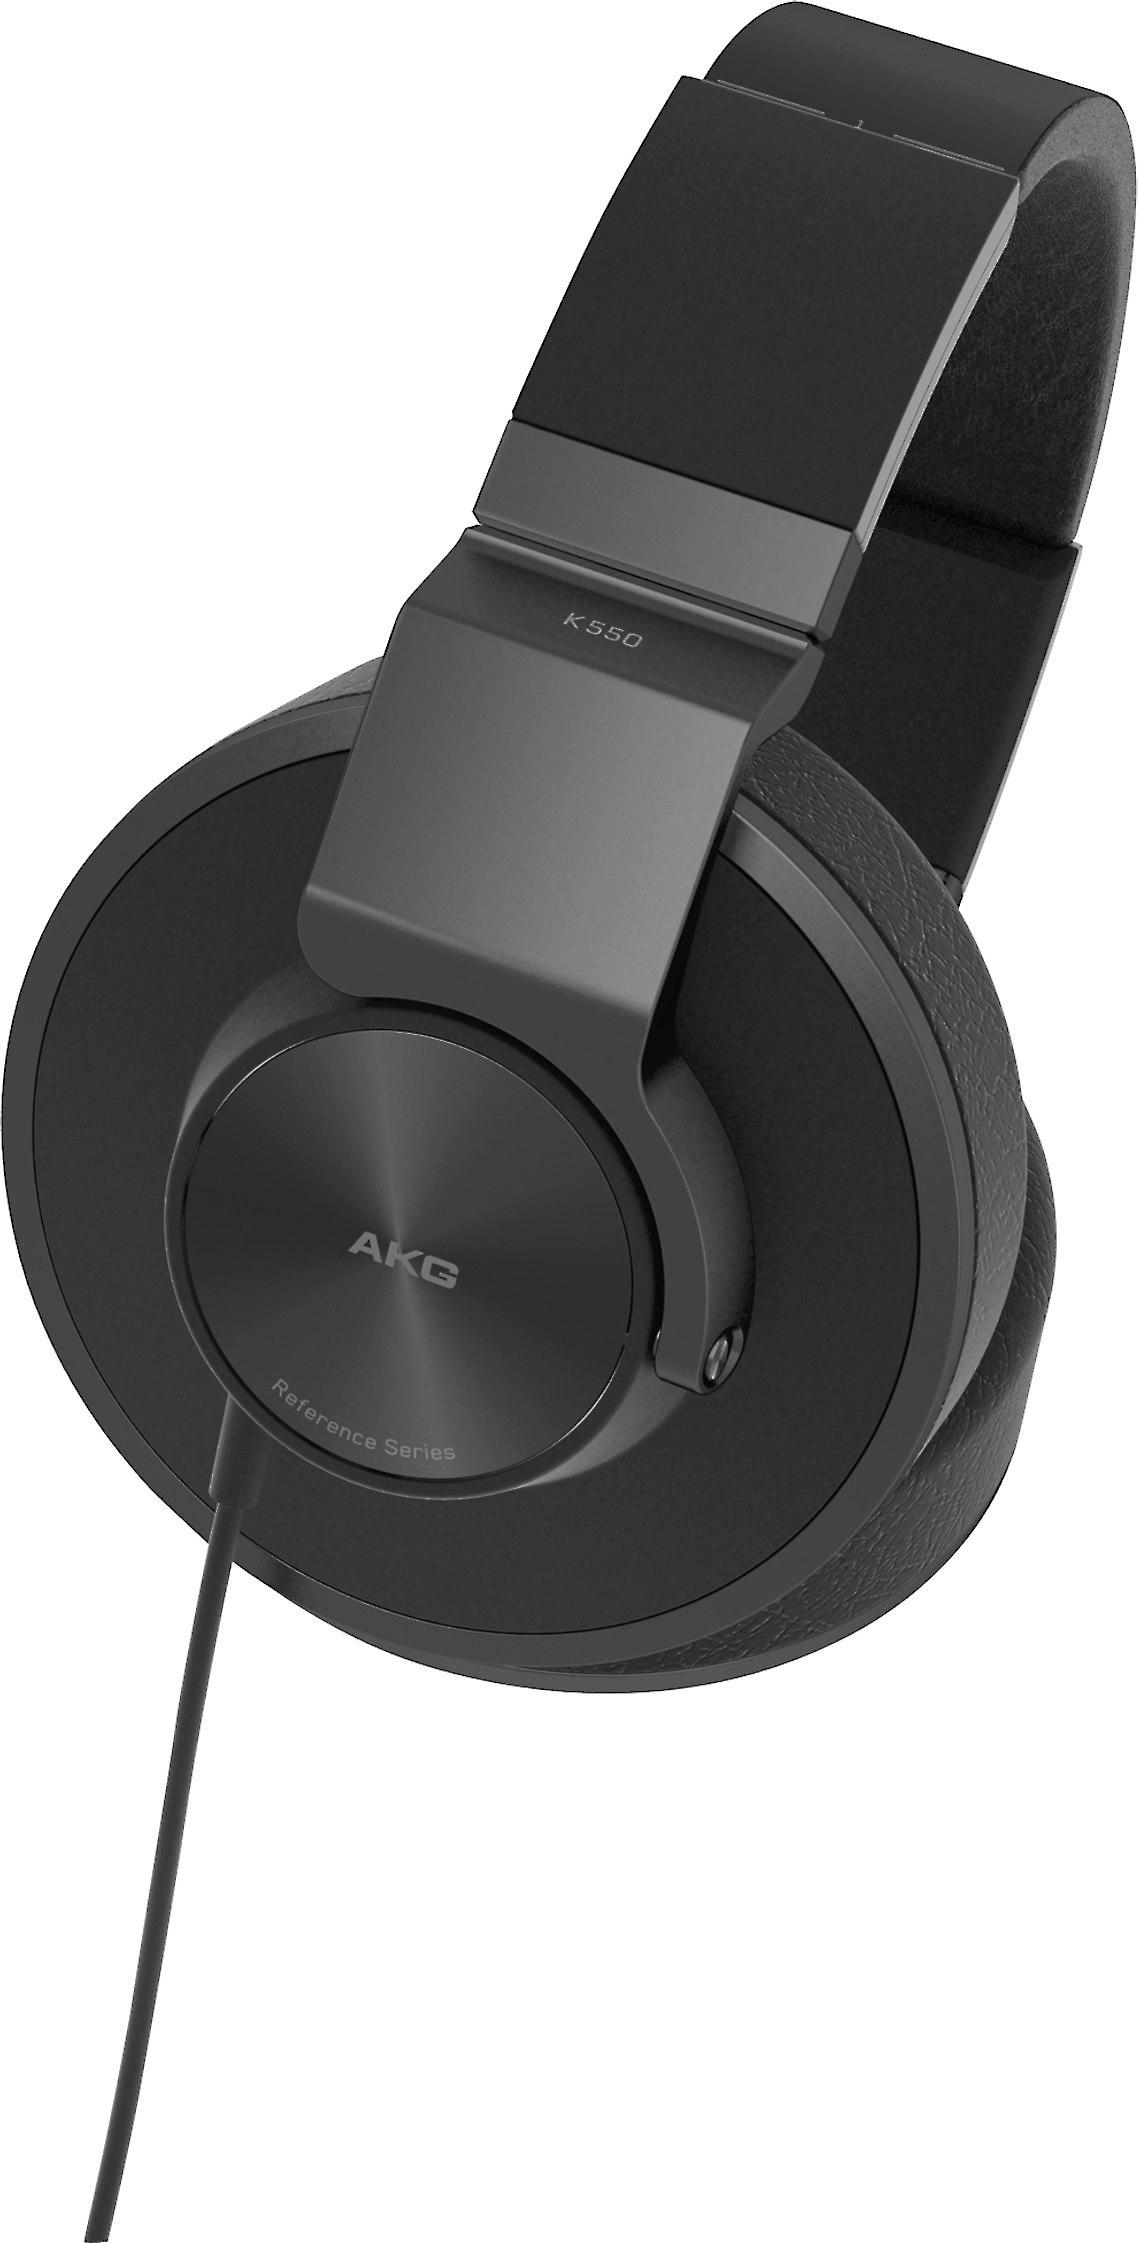 c8bb0645d4c AKG K 550 (Factory Refurbished) Around-the-ear headphones at Crutchfield.com